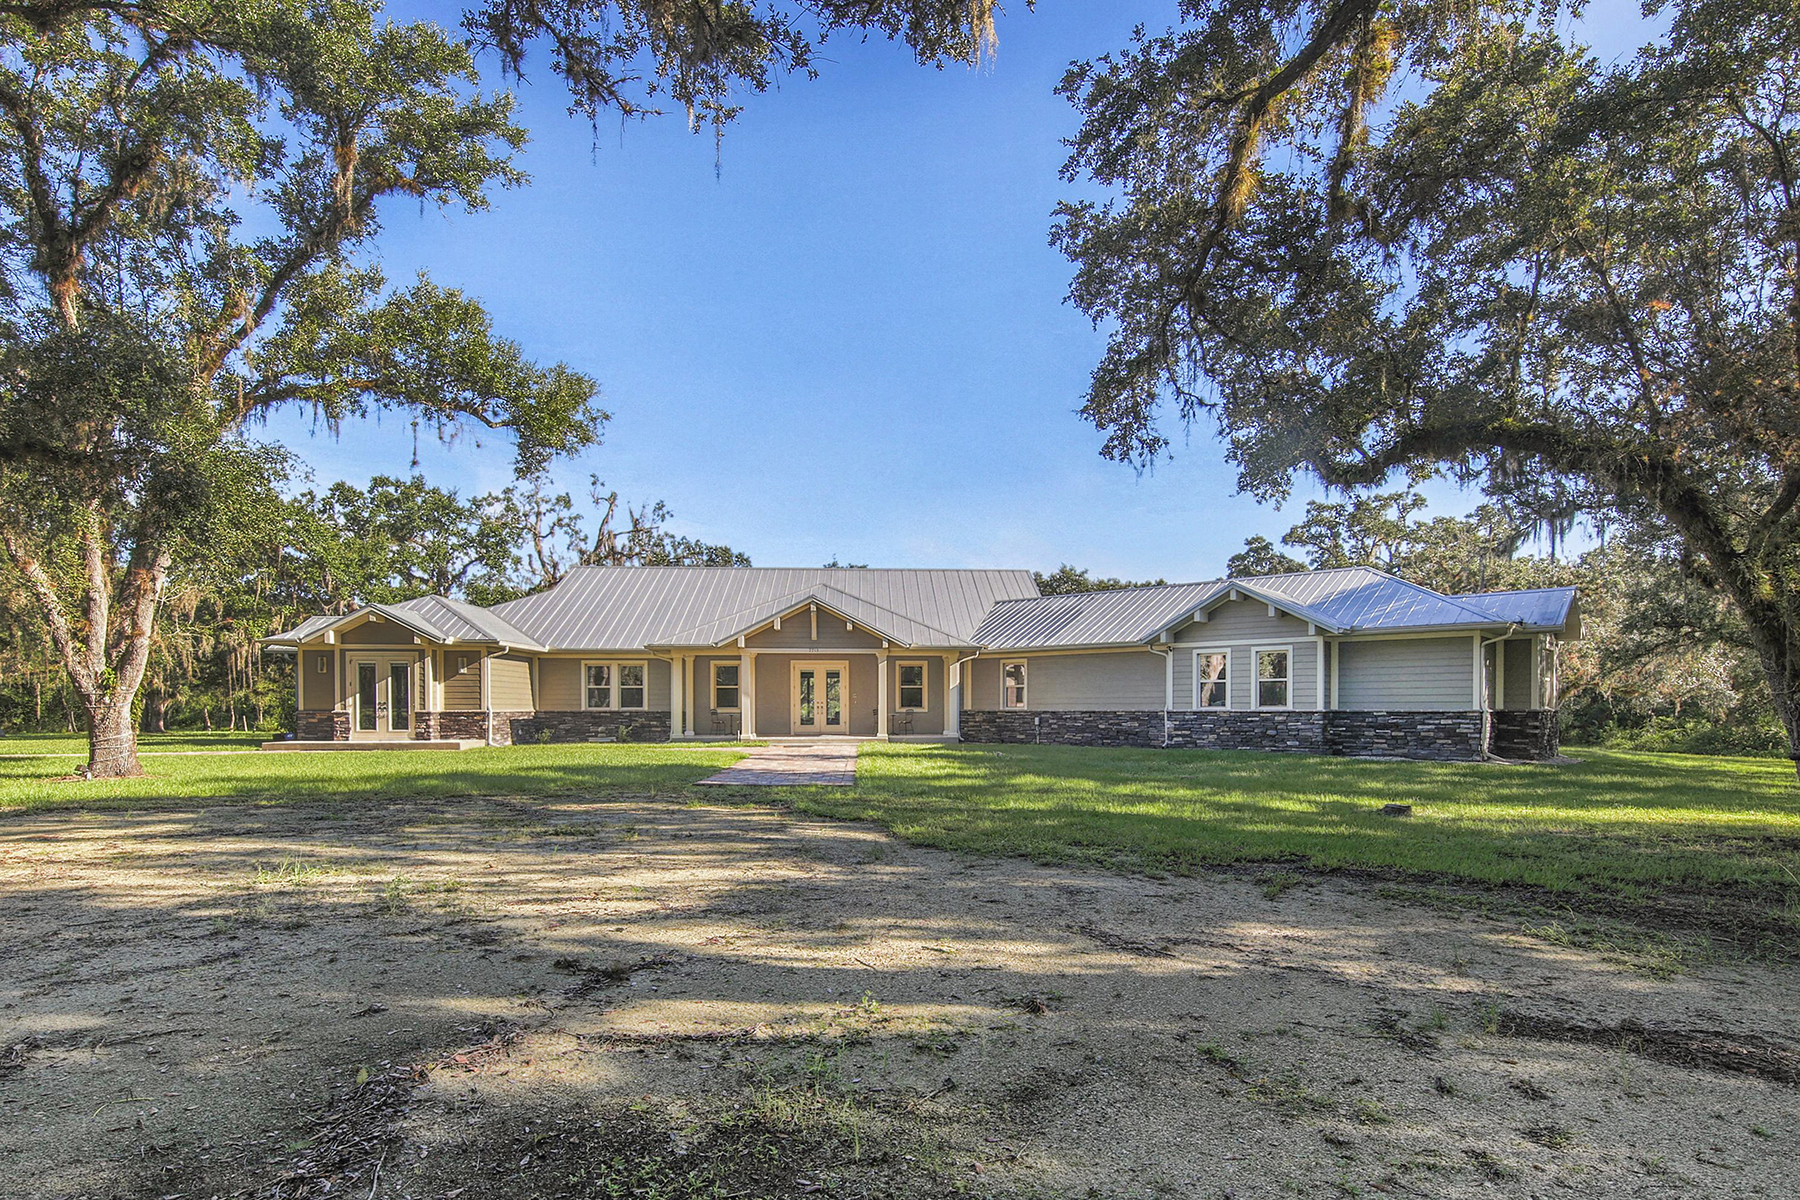 single family homes for Active at ARCADIA 7713 Sw Vineyard Ter Arcadia, Florida 34269 United States